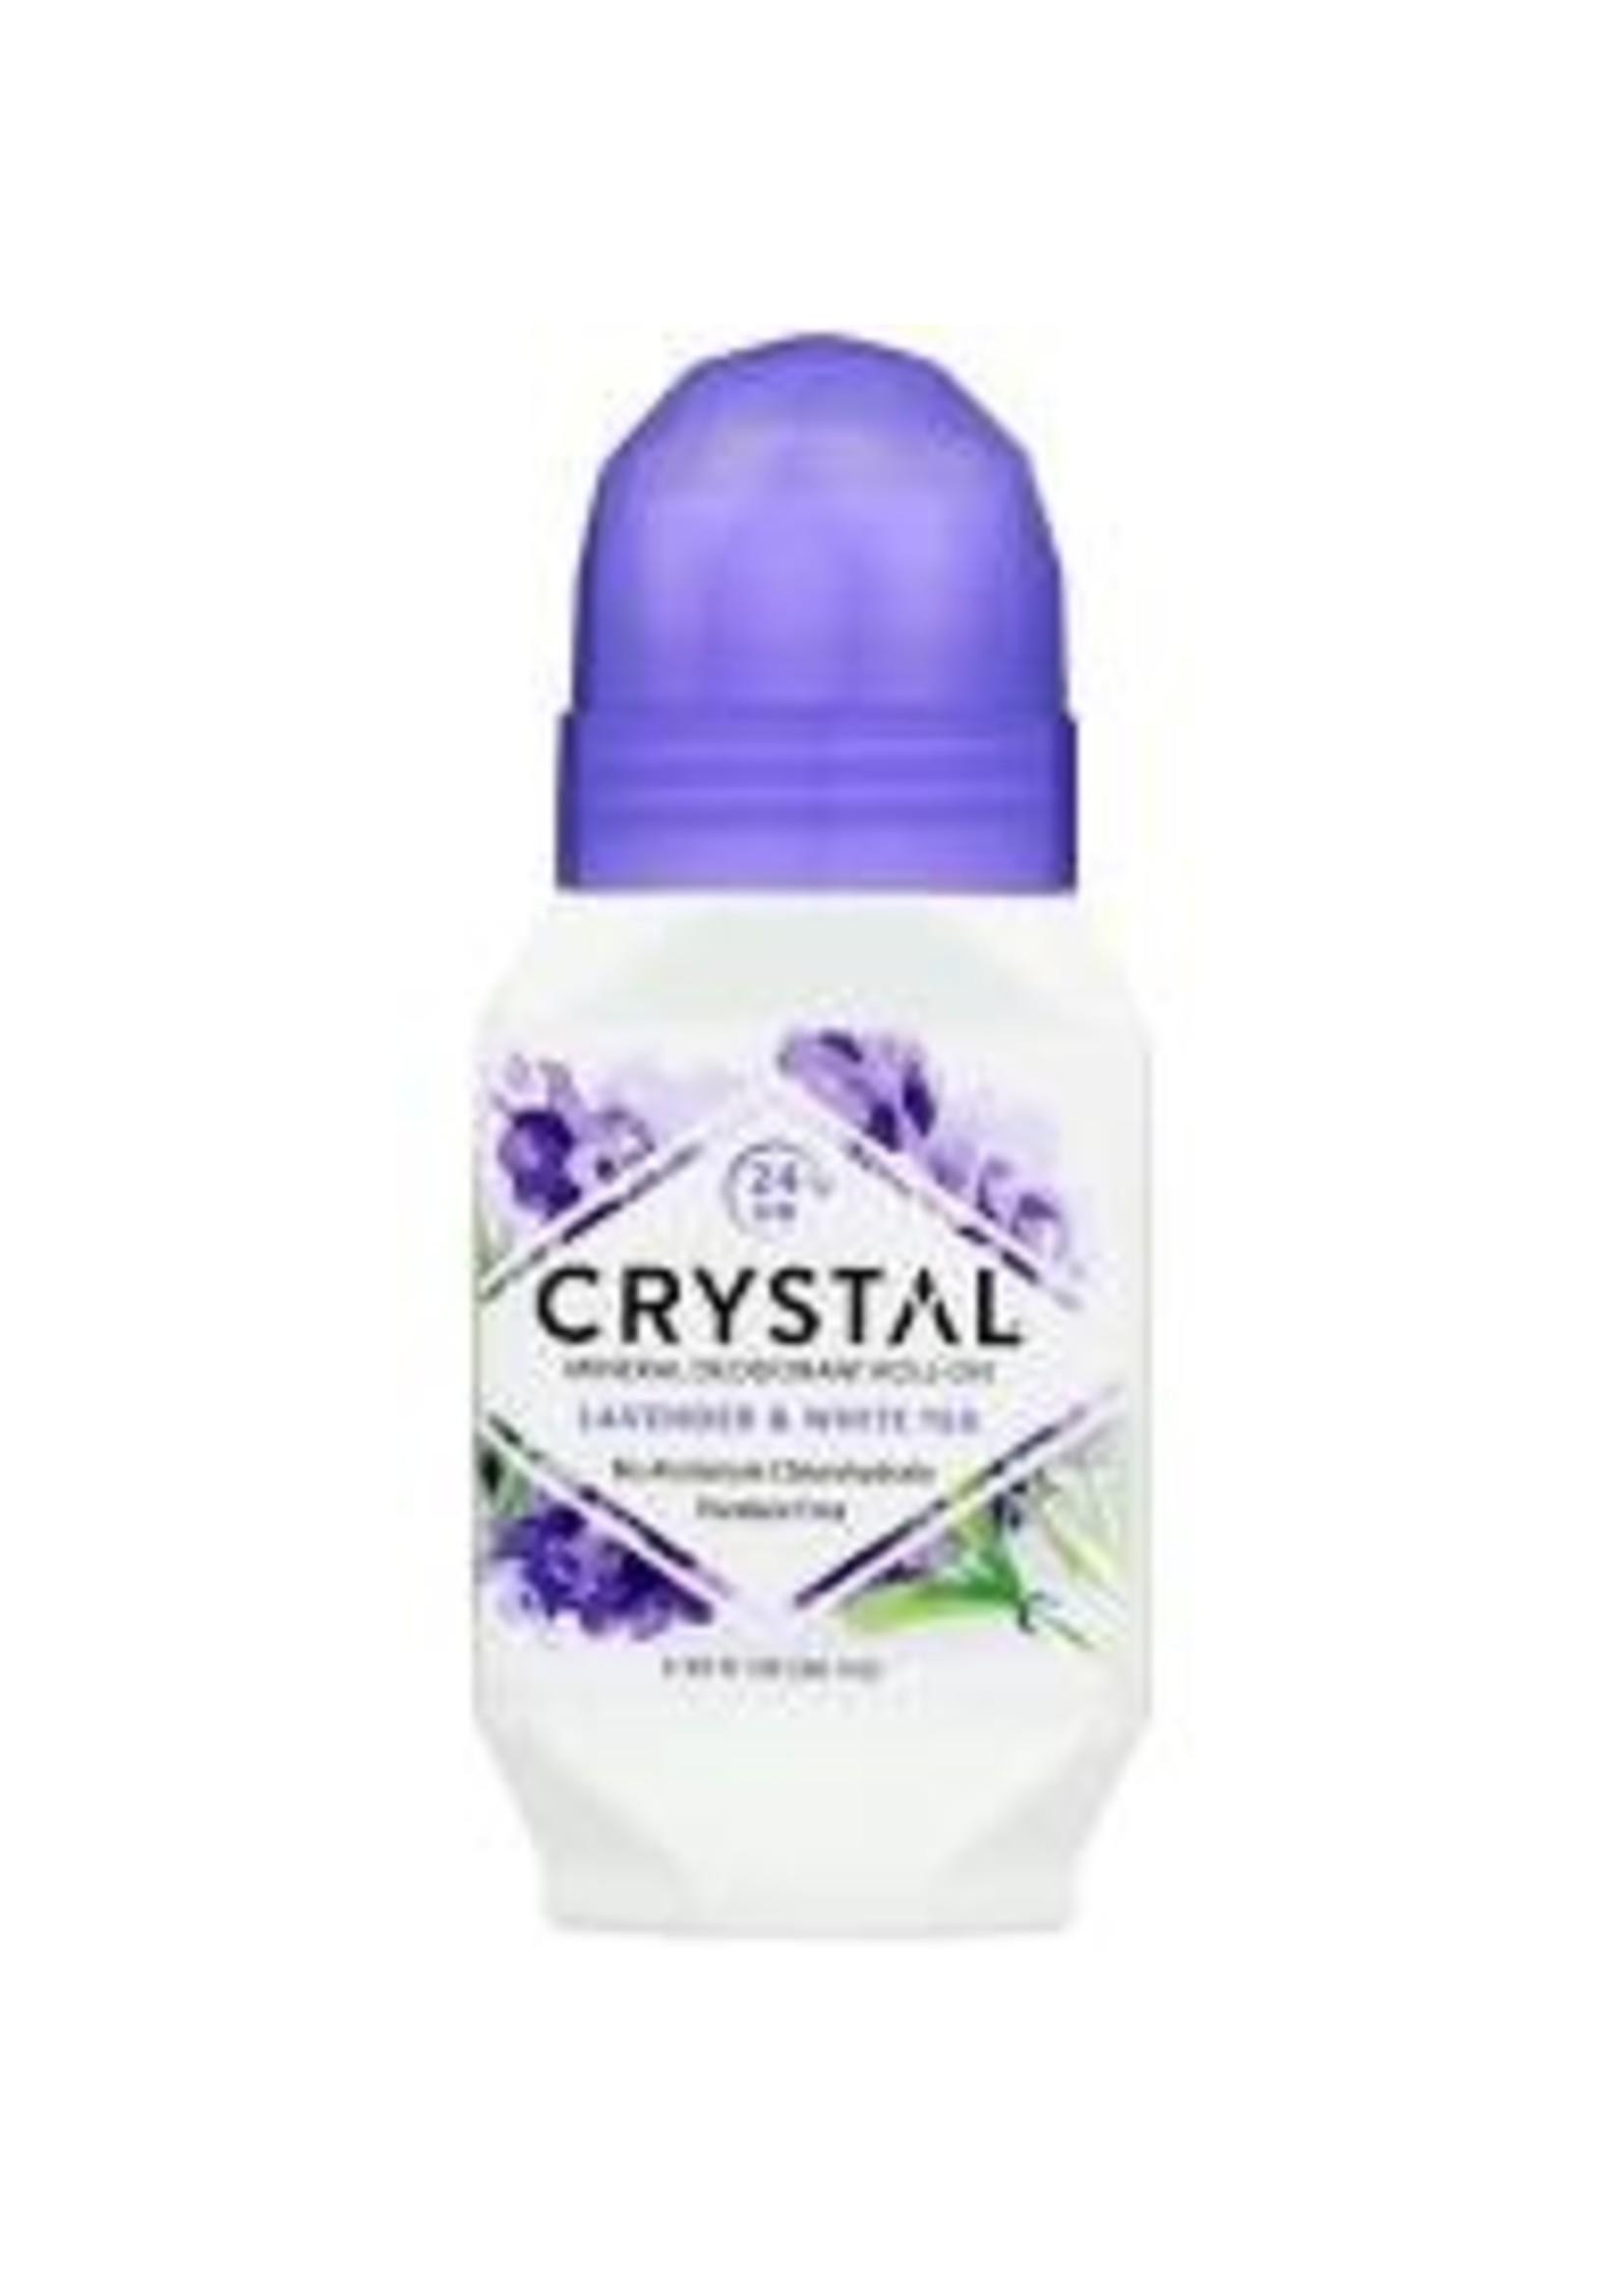 rystal Deordorant Roll on Lavender/White Tea